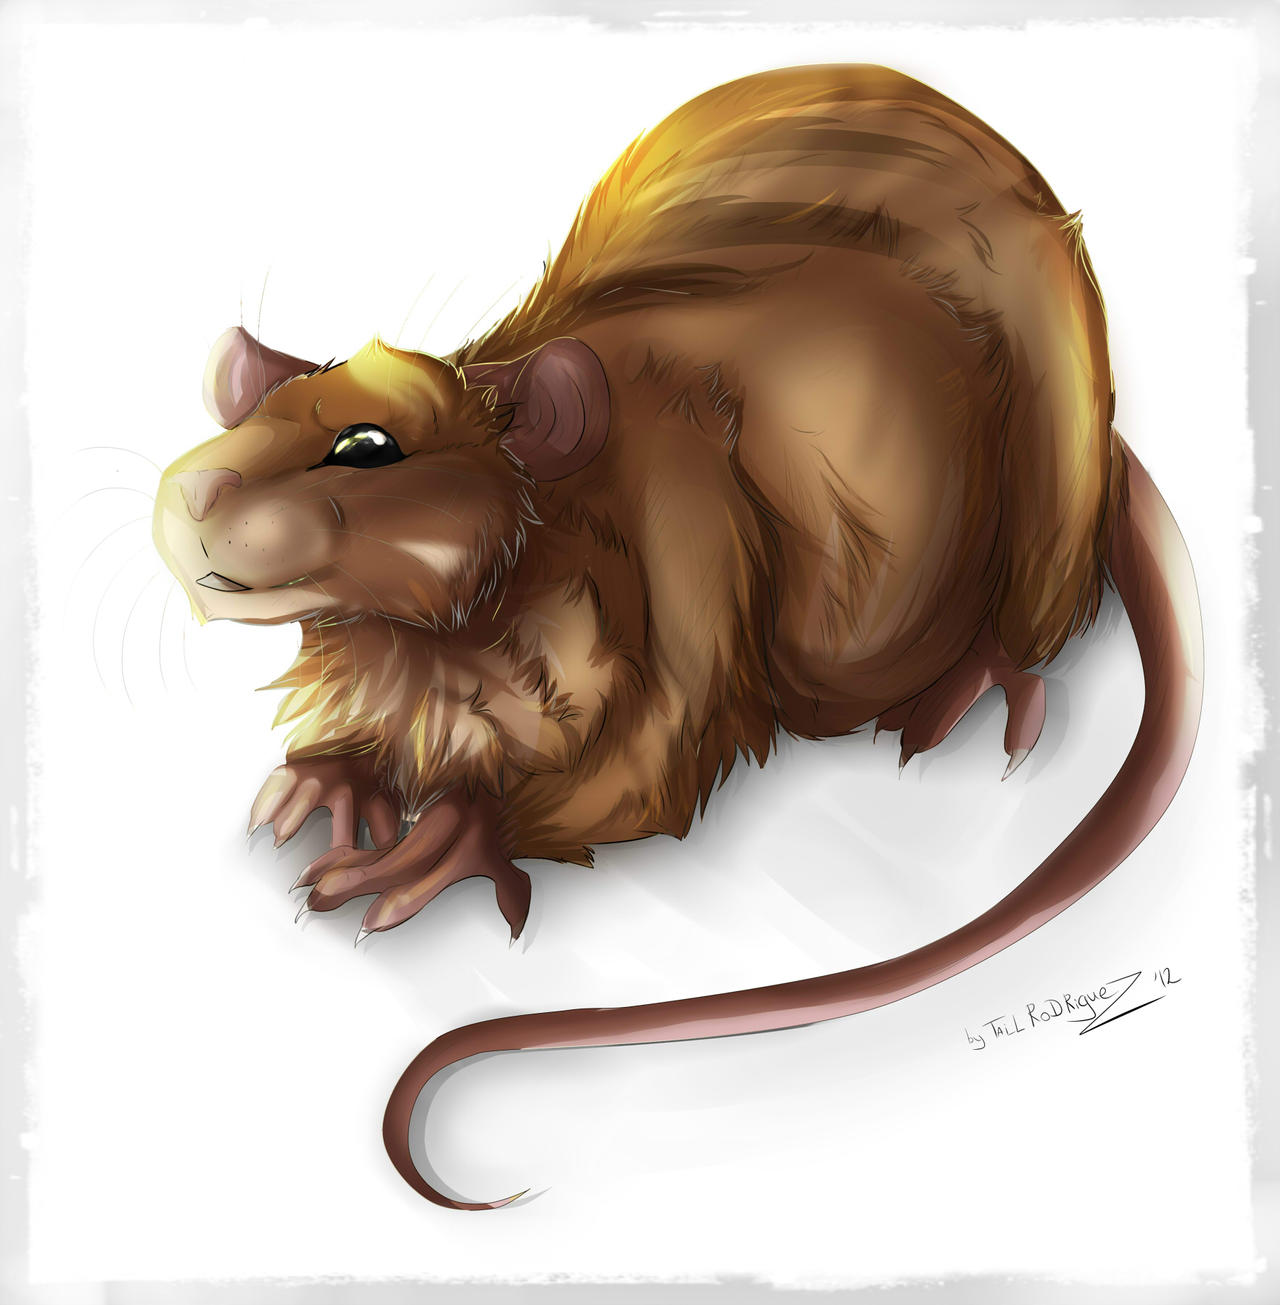 Kemili rat by Tai-L-RodRigueZ